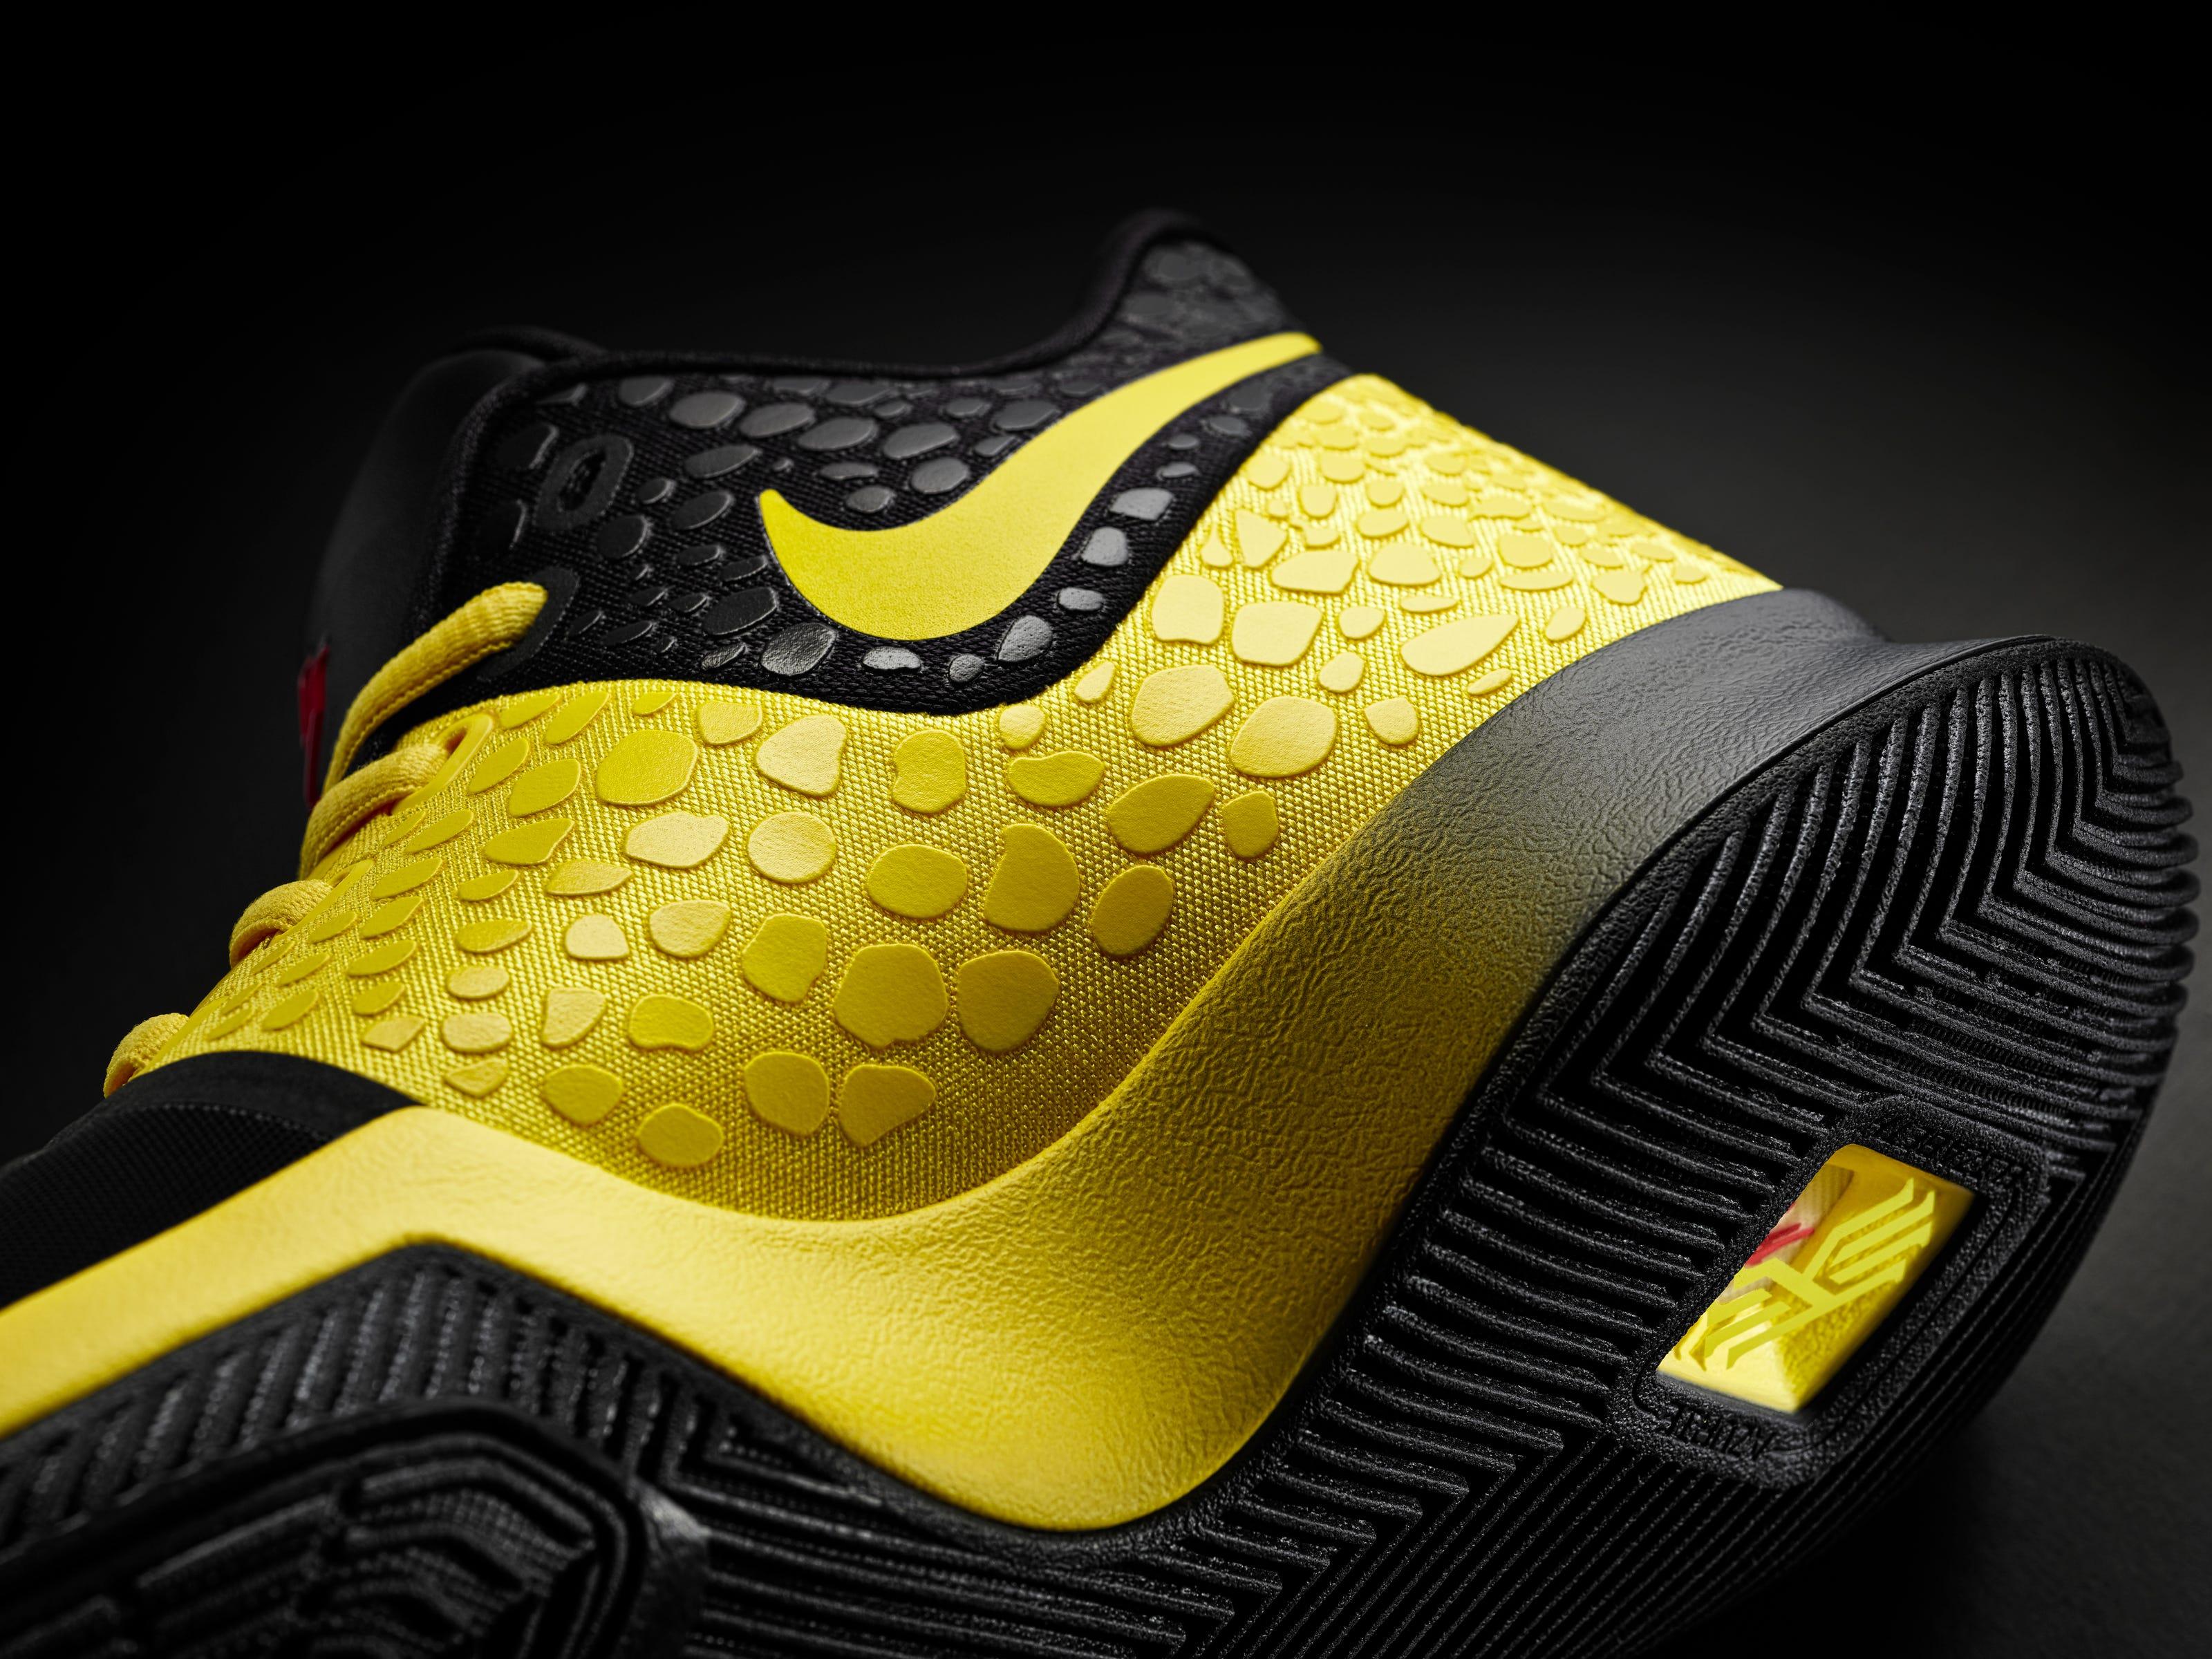 eeb65d2bc3e2a1 Oregon women s basketball team gets custom Air Jordan 6 sneakers